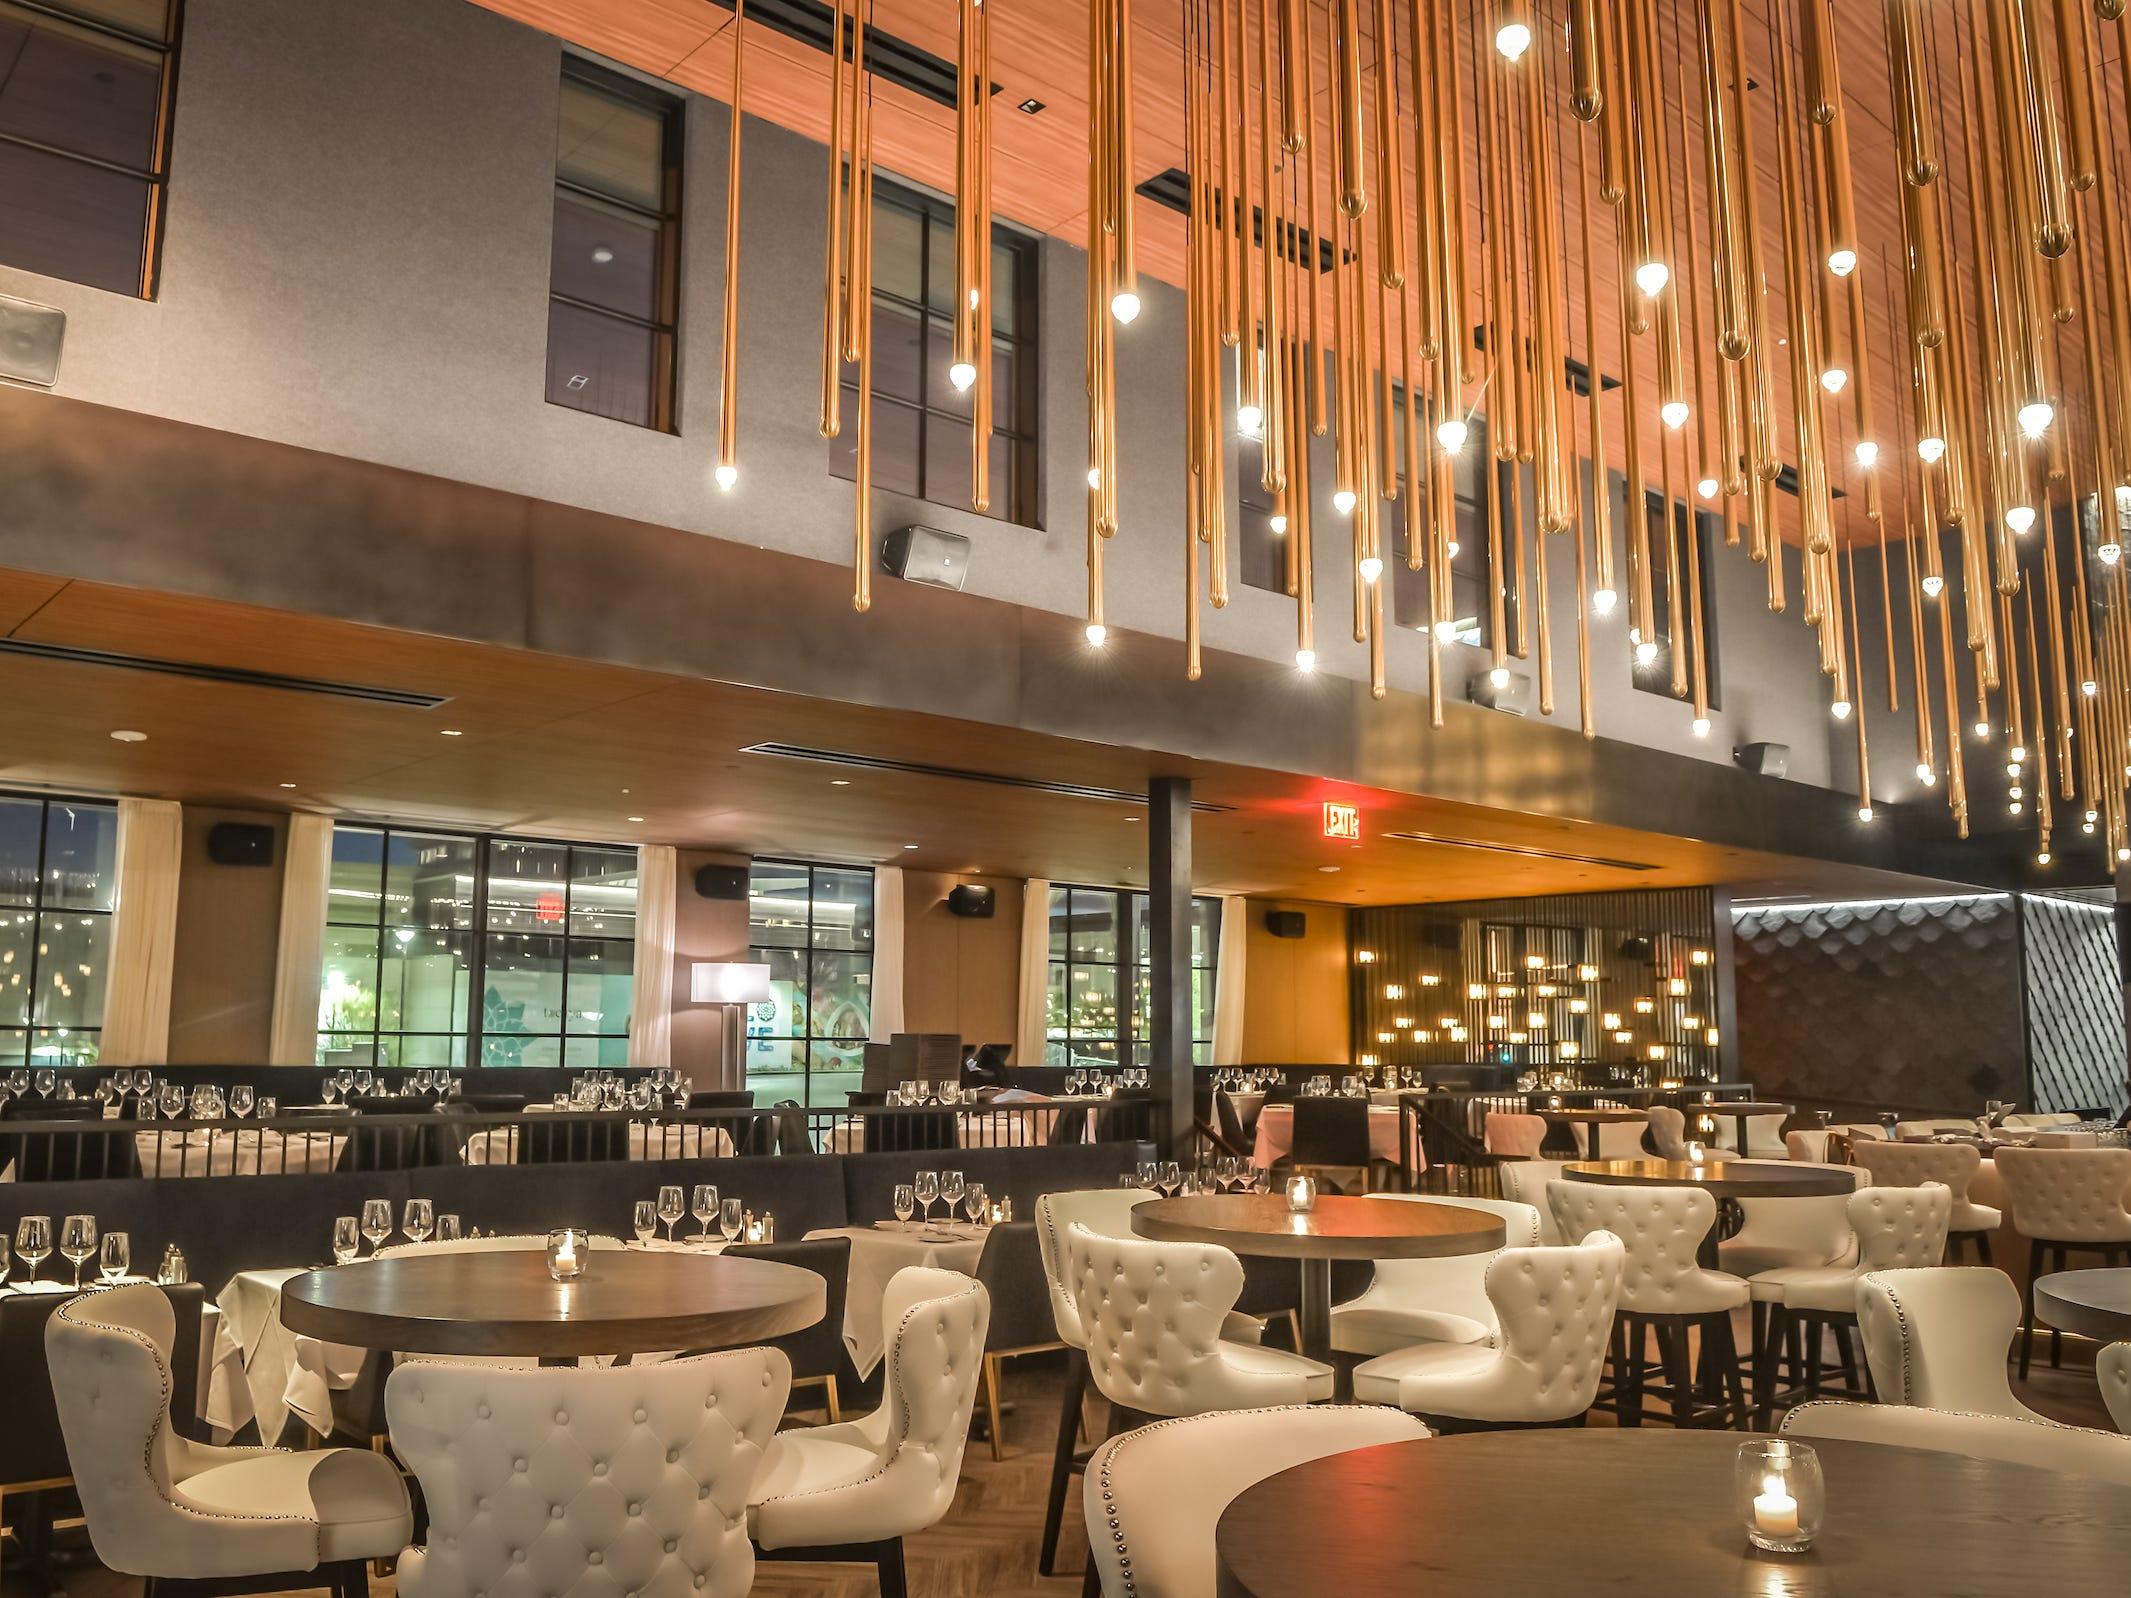 The dining room inside Ocean 44 in Scottsdale.